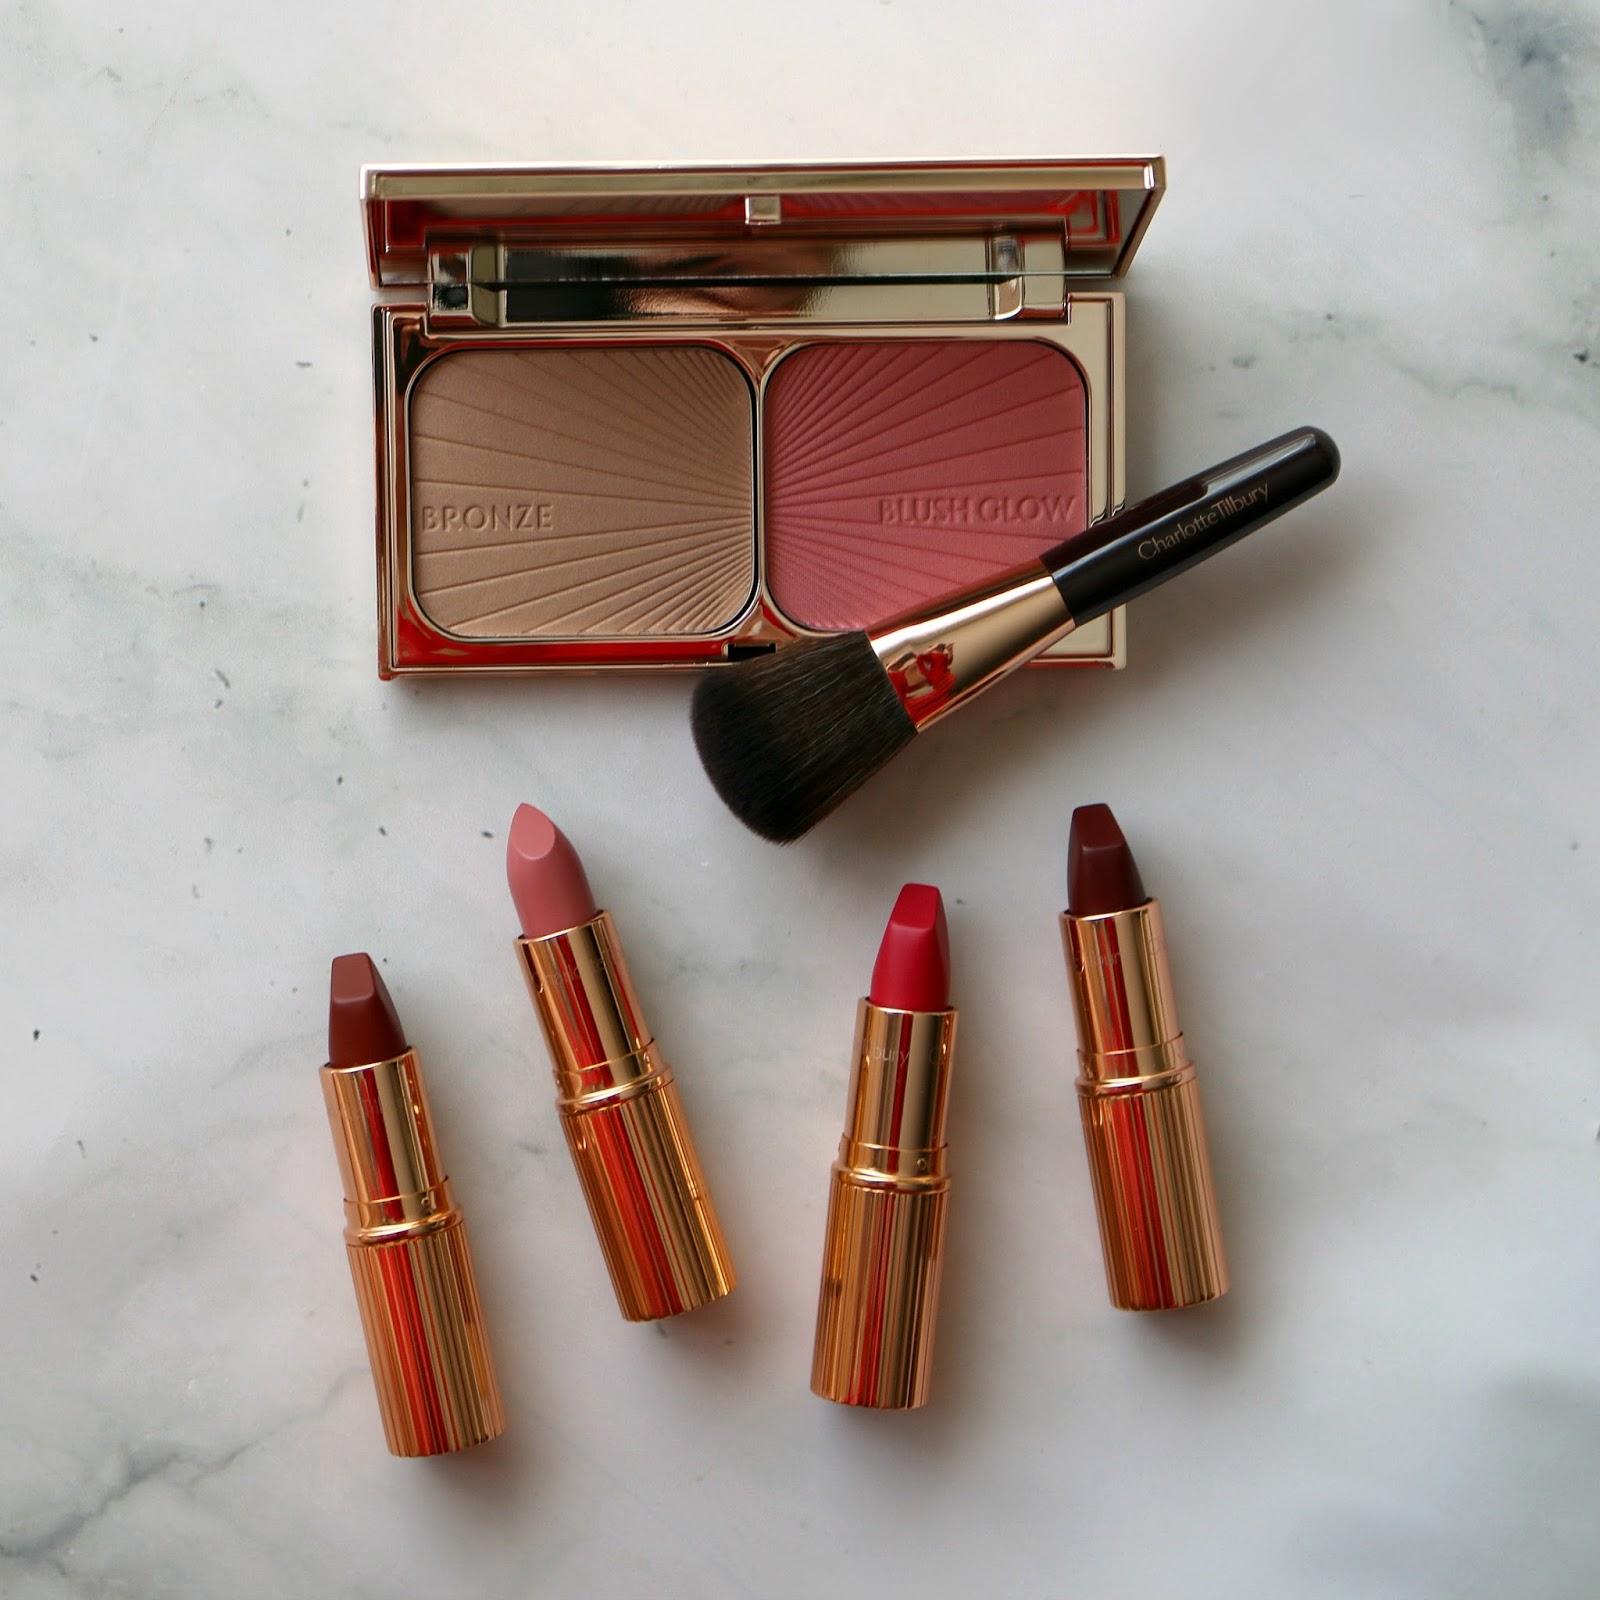 charlotte tilbury filmstar bronze blush glow your lip service royal lipstick trio